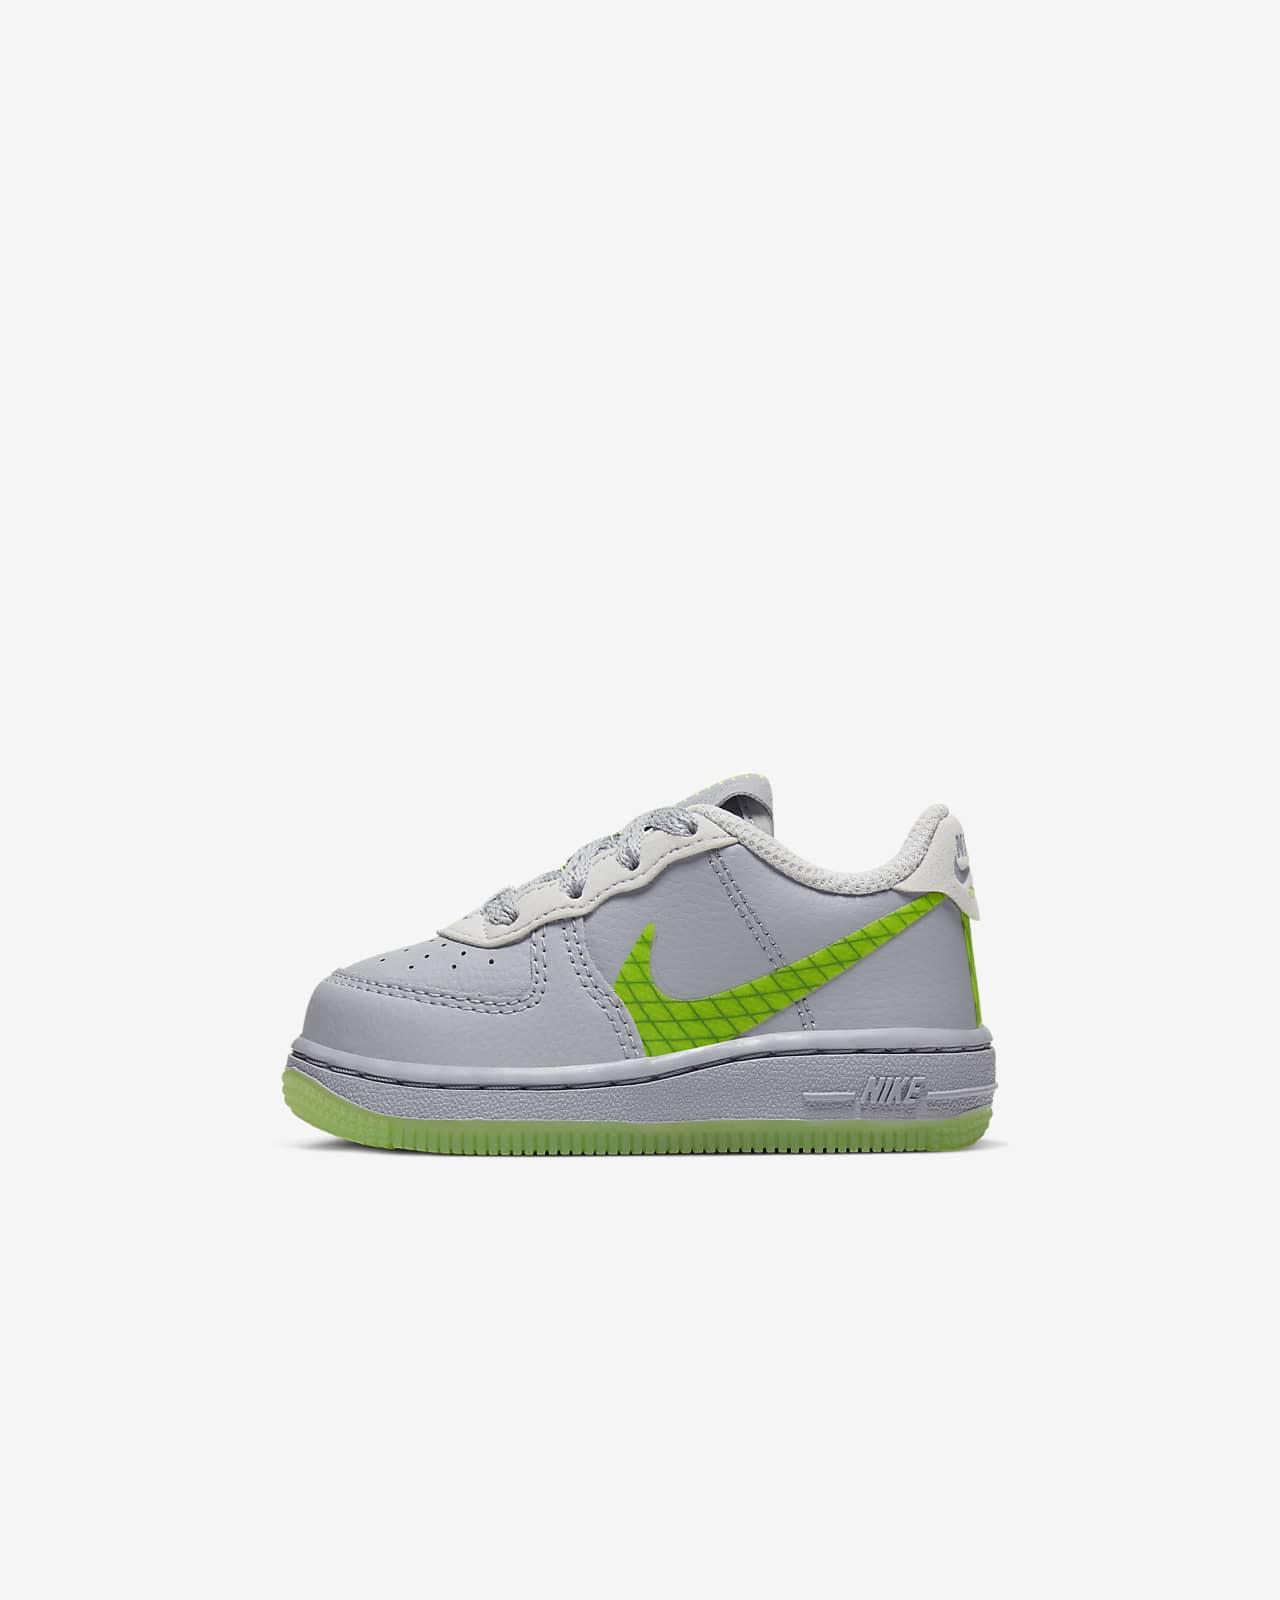 Nike Force 1 LV8 3 Baby/Toddler Shoe